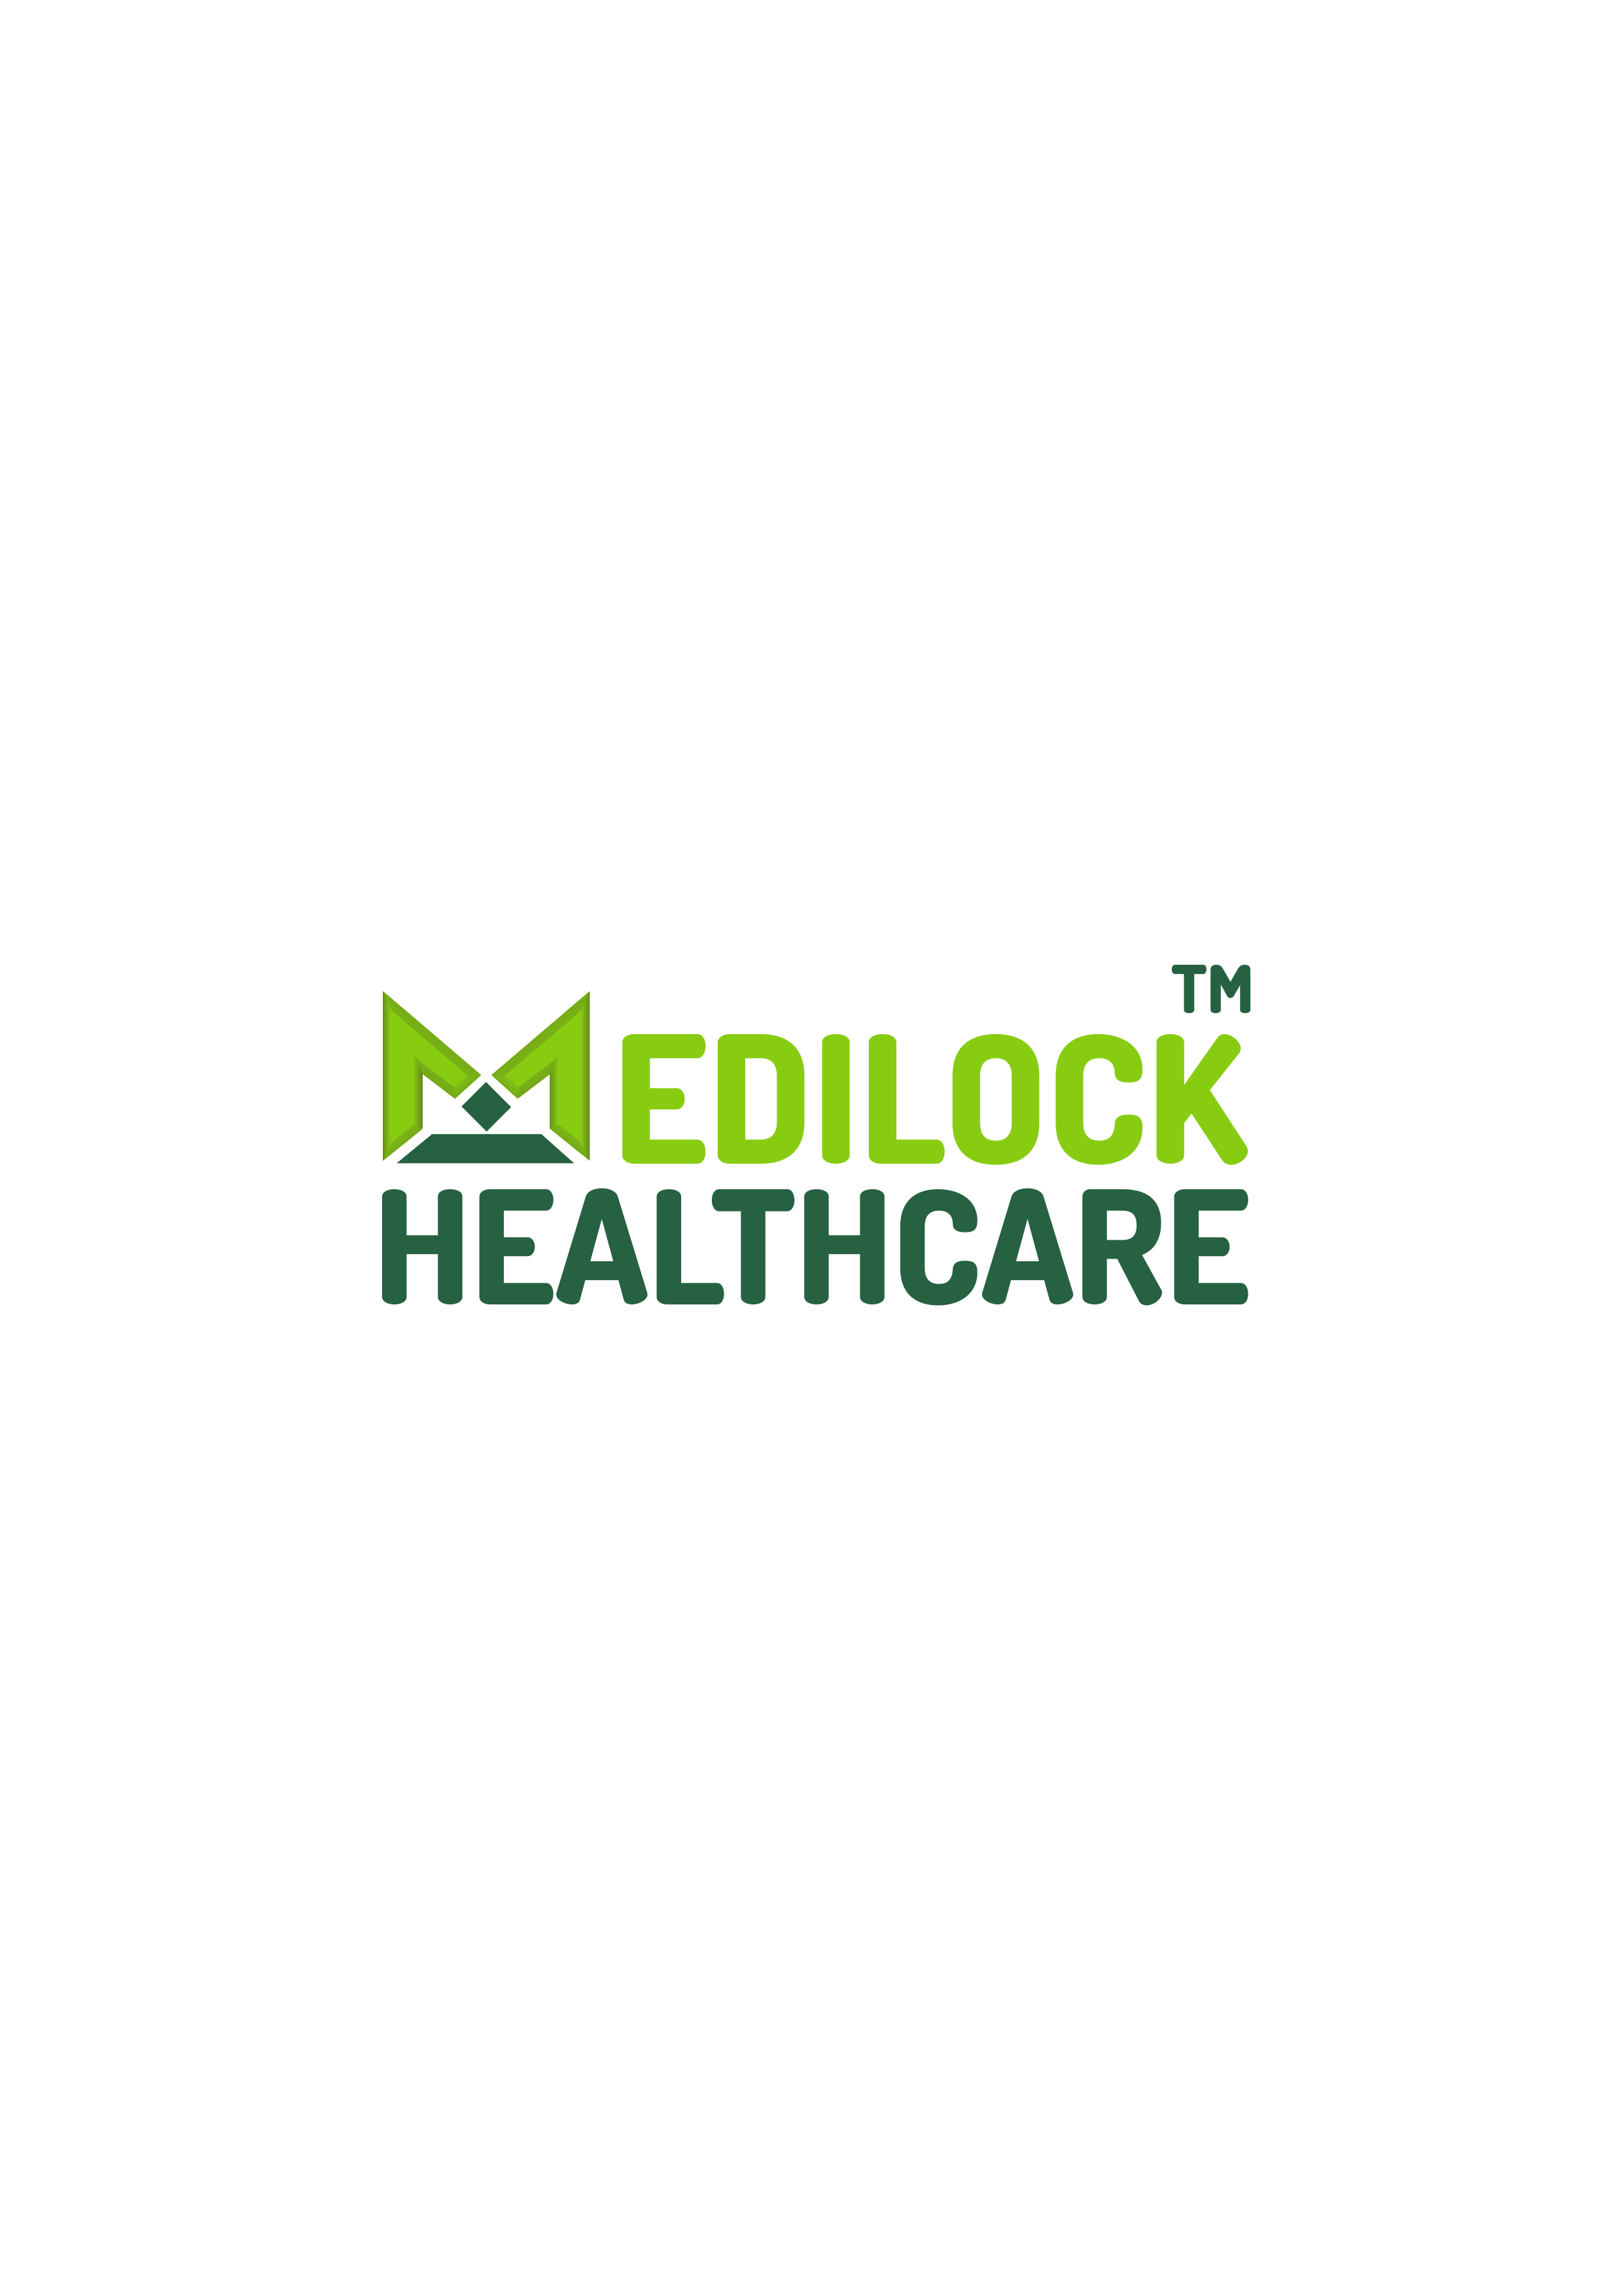 Medilock Healthcare